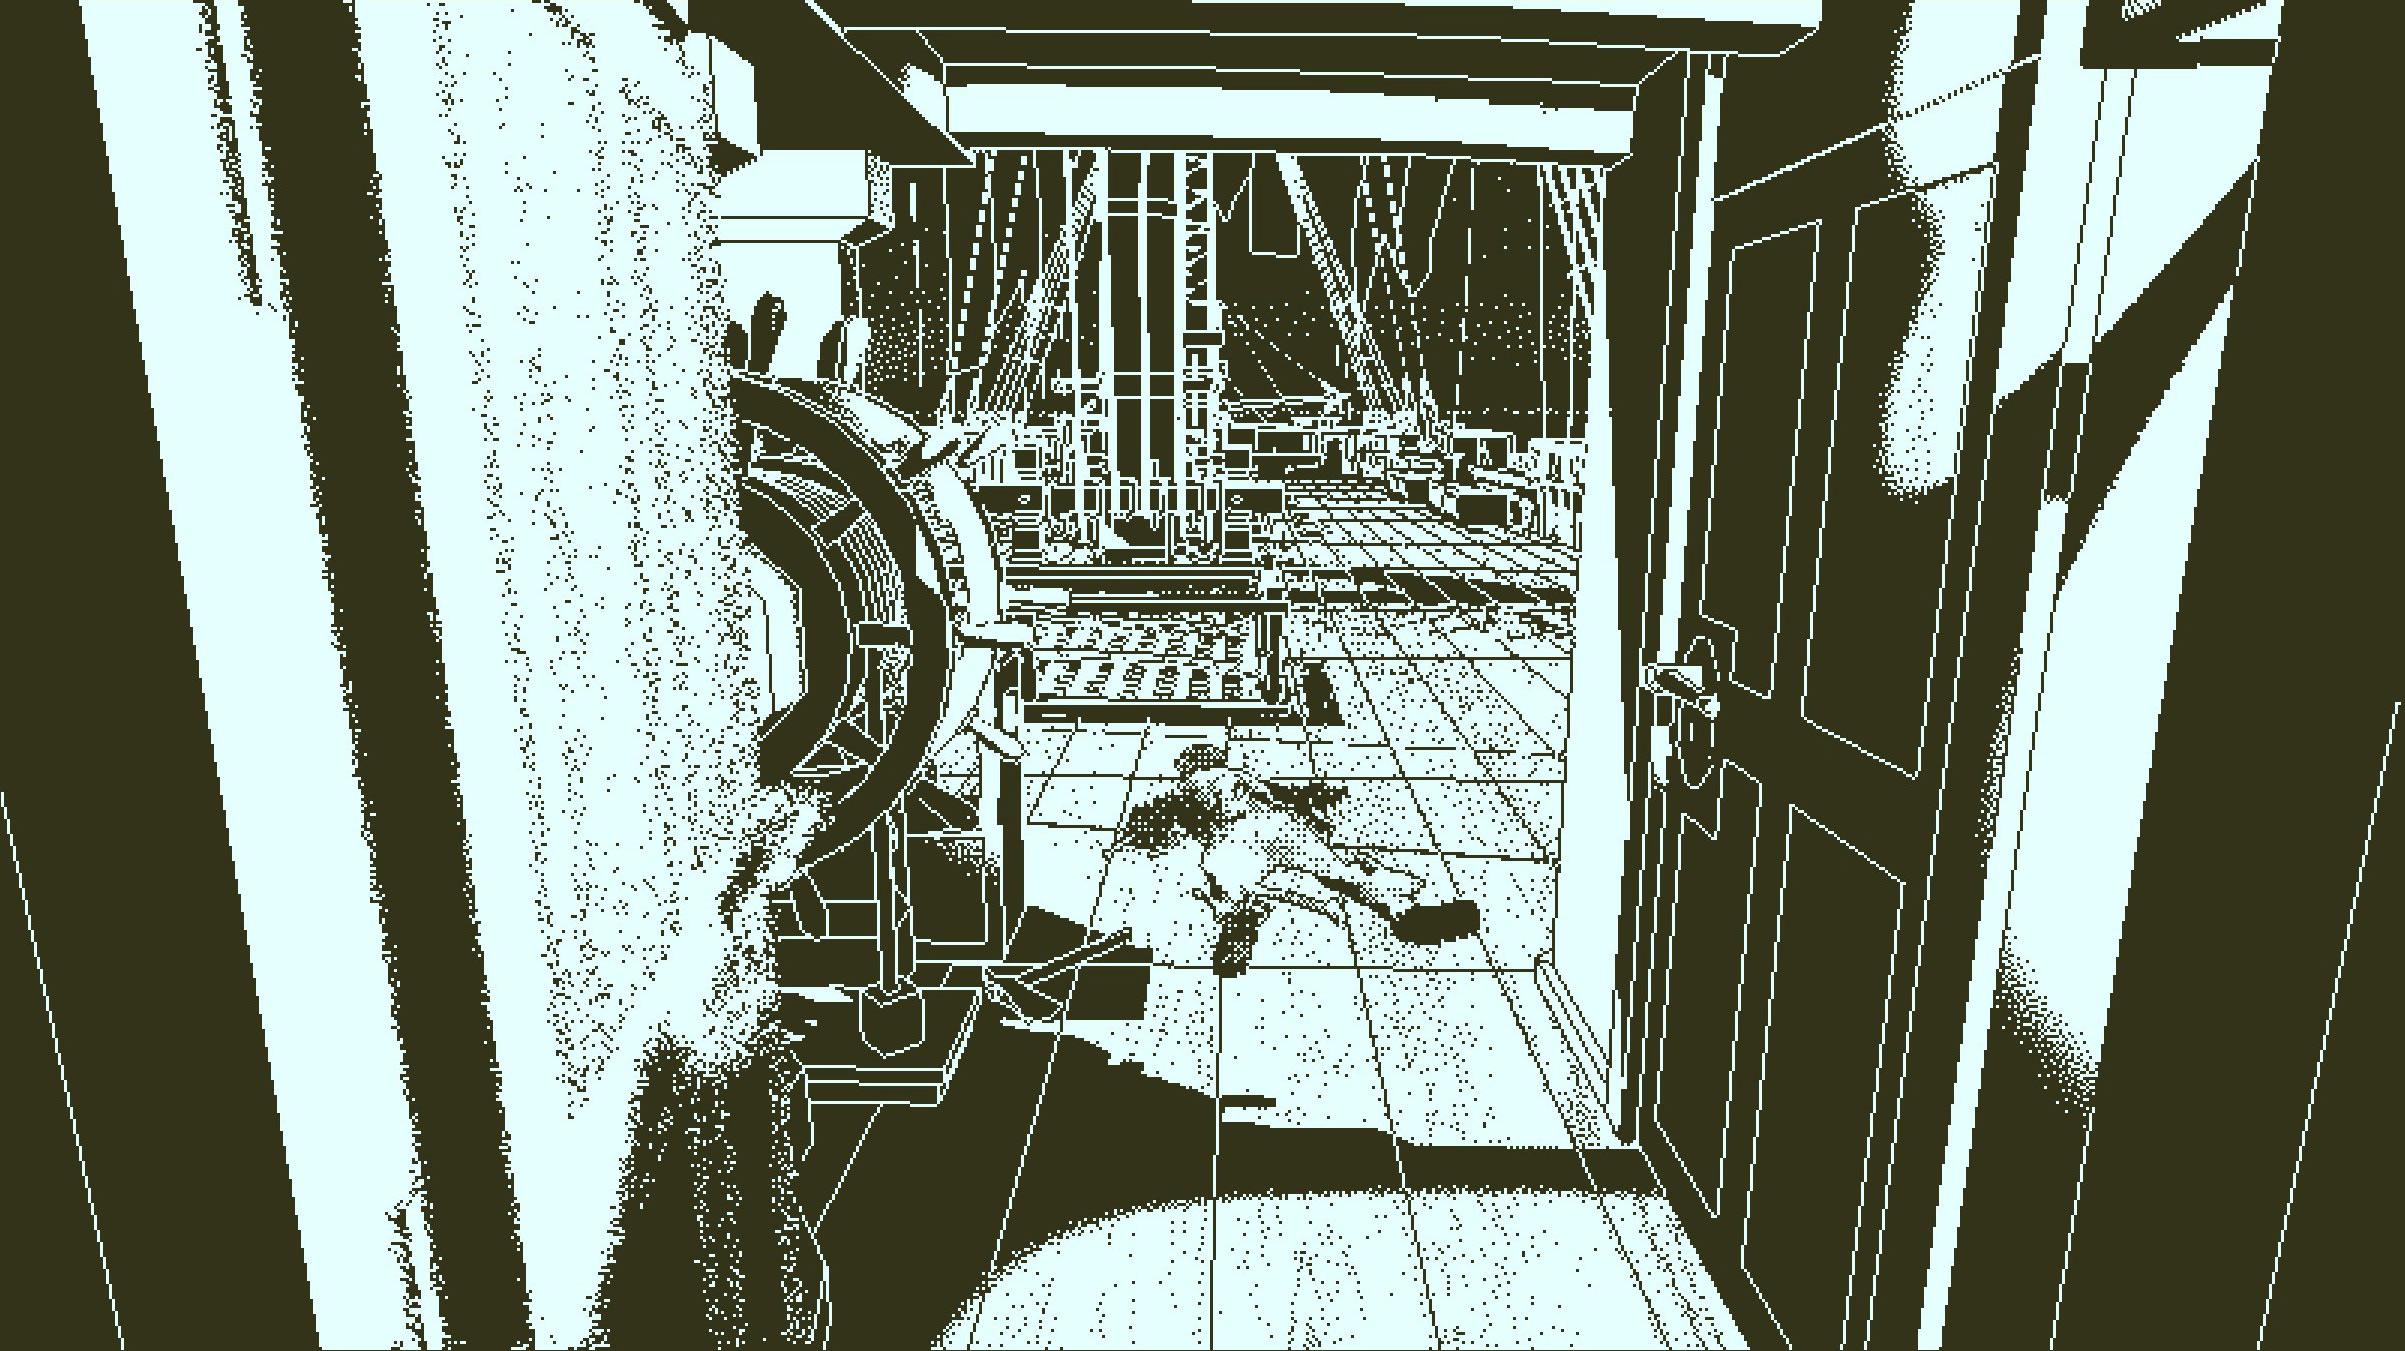 Return of the Obra Dinn - a body on the deck